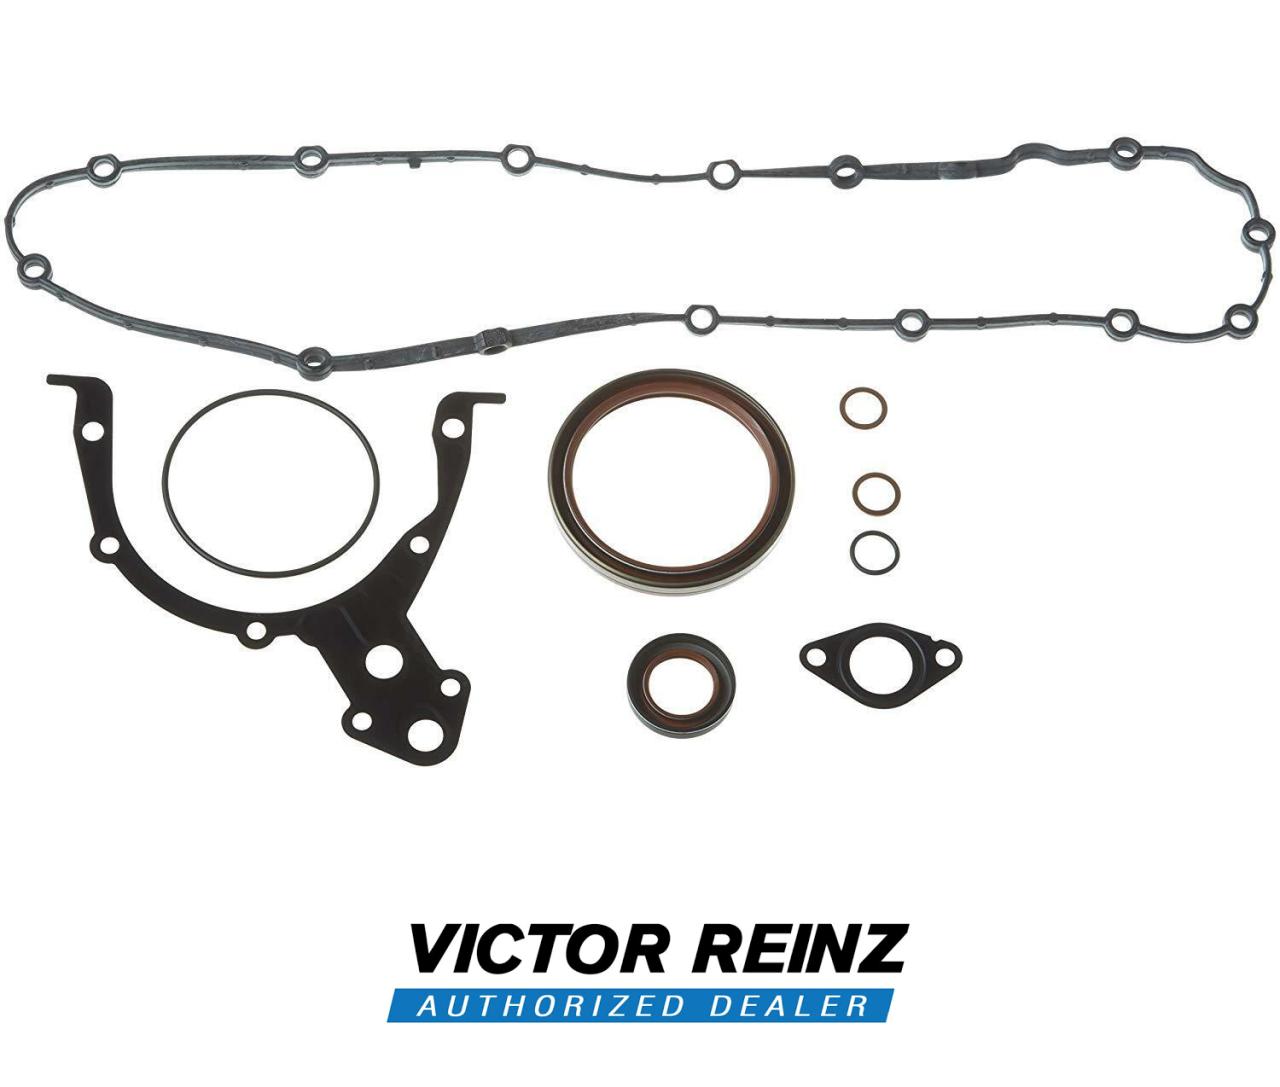 Opel Astra G 1.4 - 1.6 16 Valf Alt Takım Conta Victor Reinz